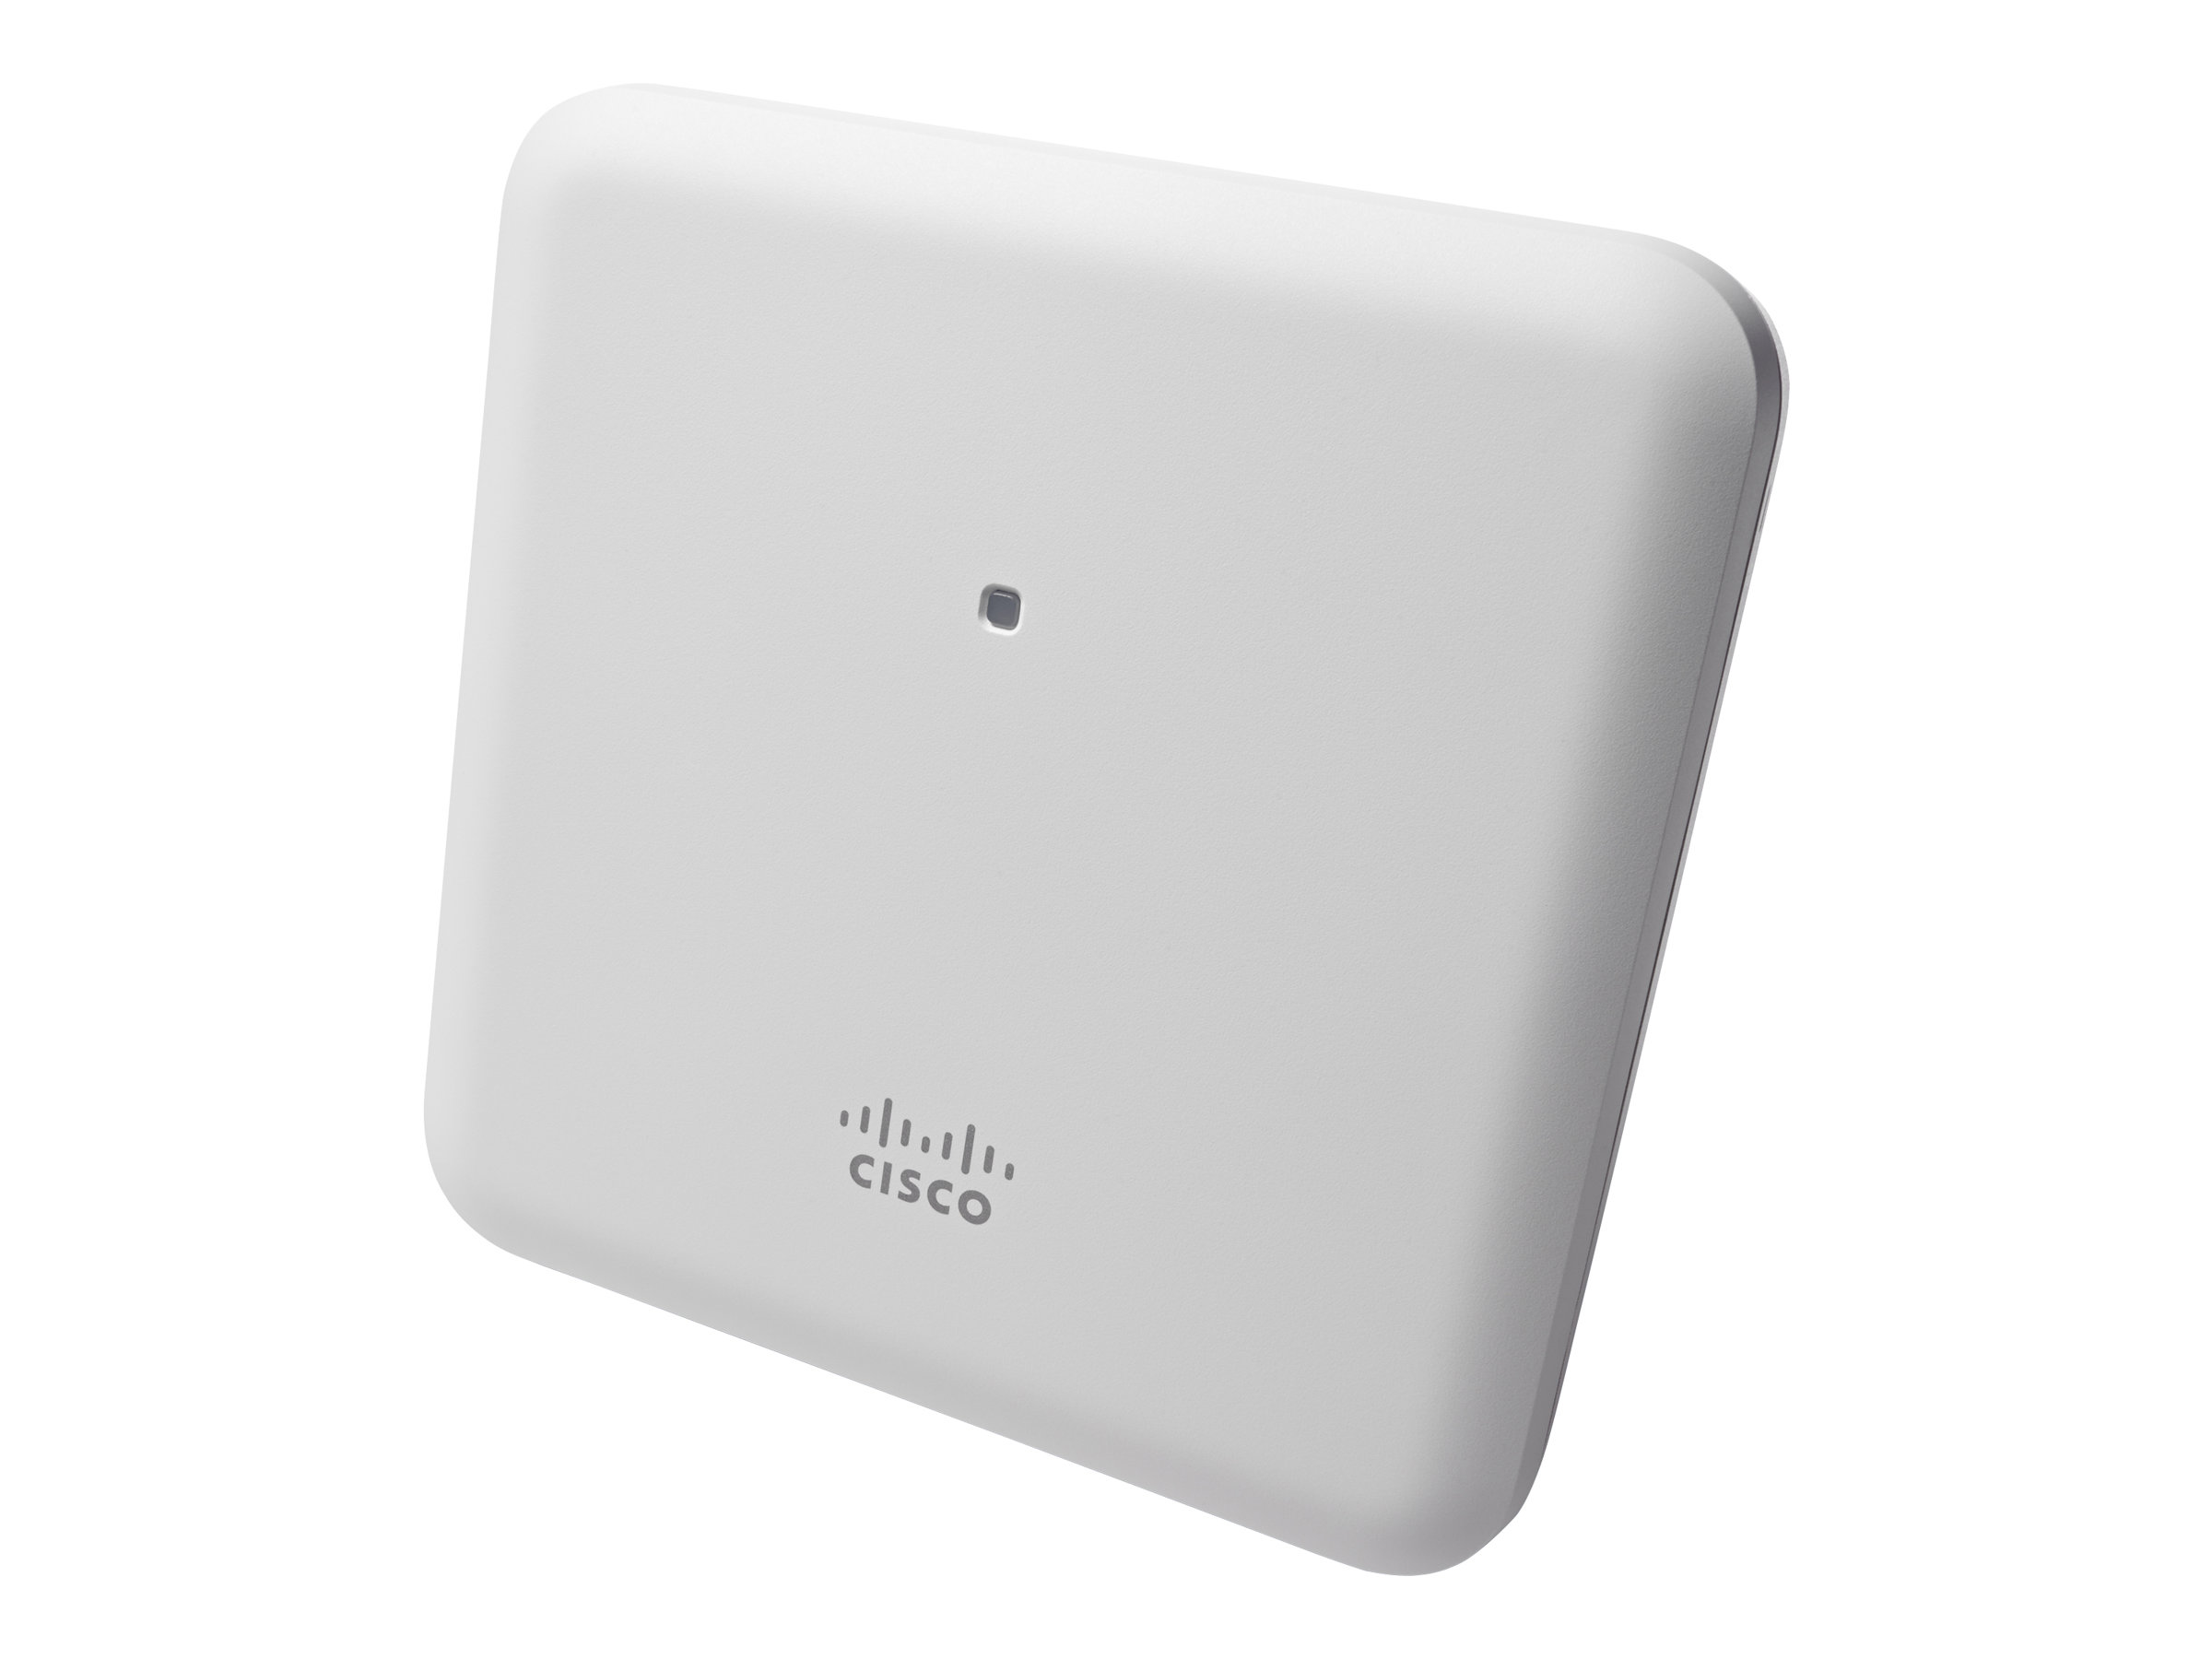 Cisco Aironet 1852I - Drahtlose Basisstation